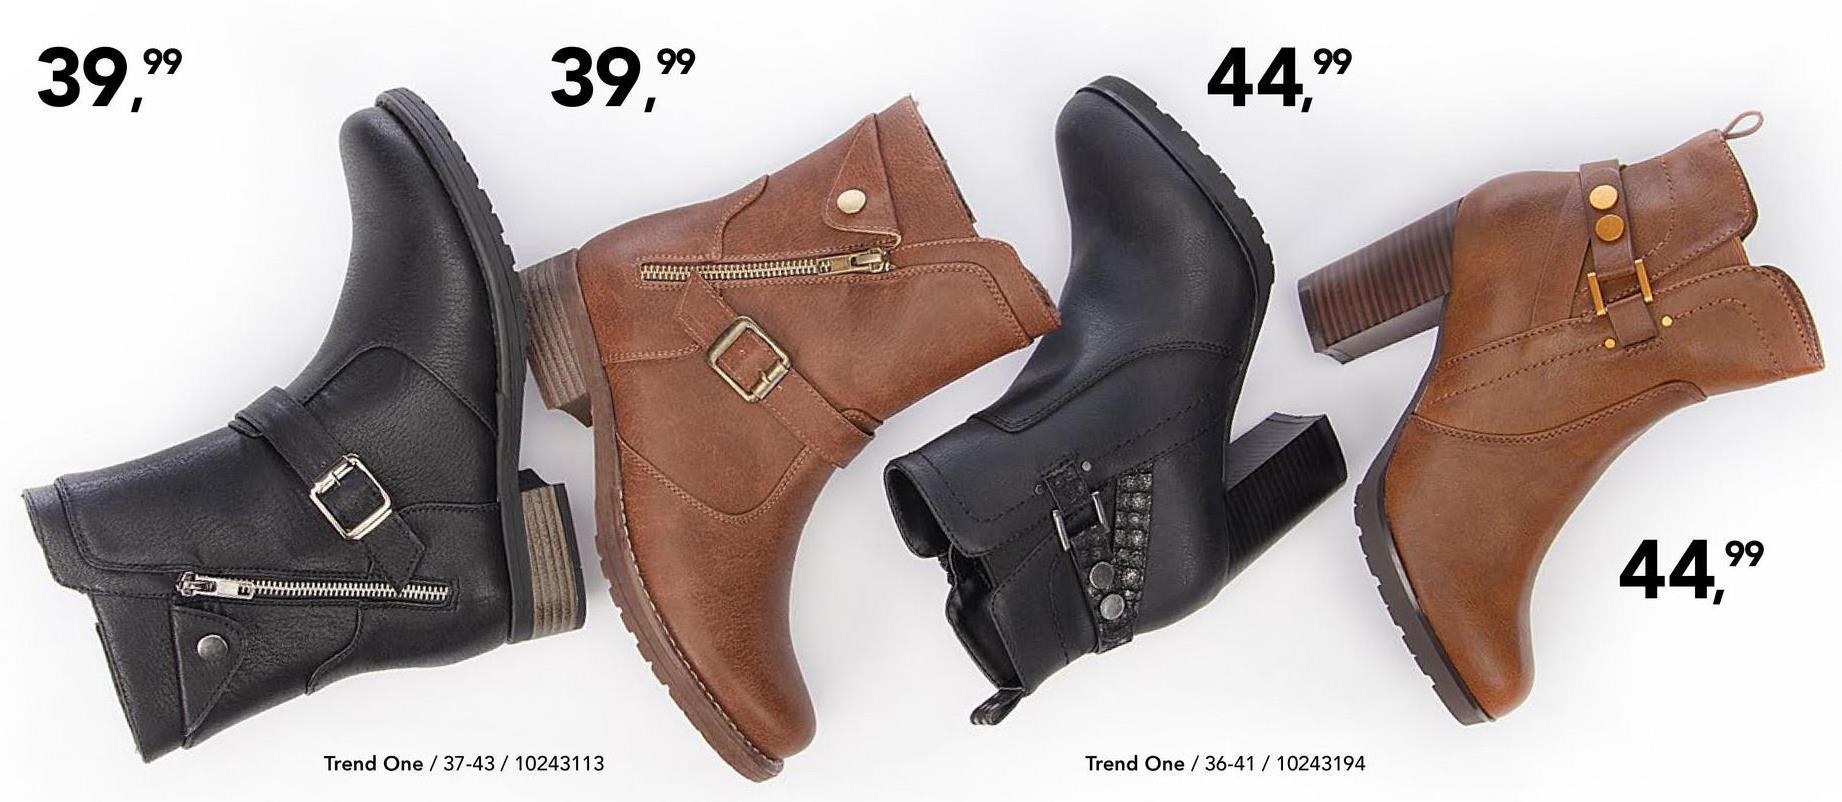 Enkellaars Trend One - Zwart Casual enkellaars met comfortabele blokhak en leuk design van het merk Trend One voor vrouwen.